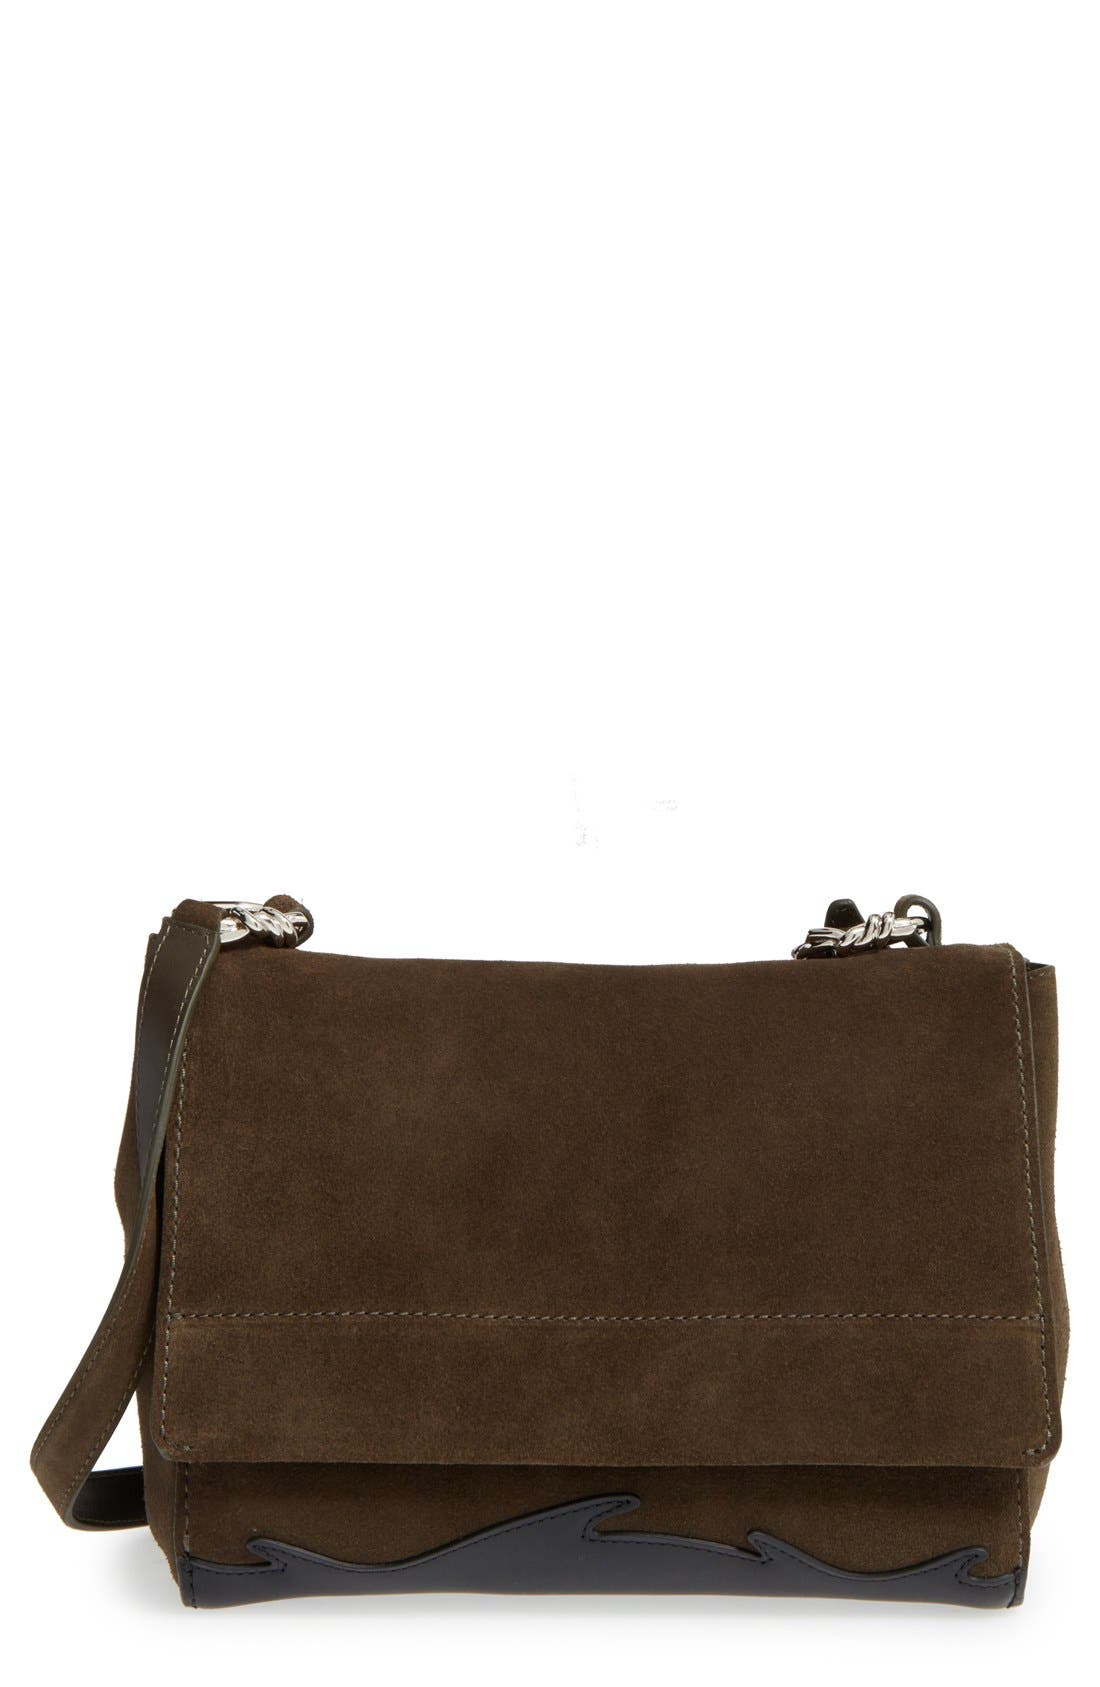 Main Image - 3.1 Phillip Lim 'Ames - Patchwork' Leather Crossbody Bag